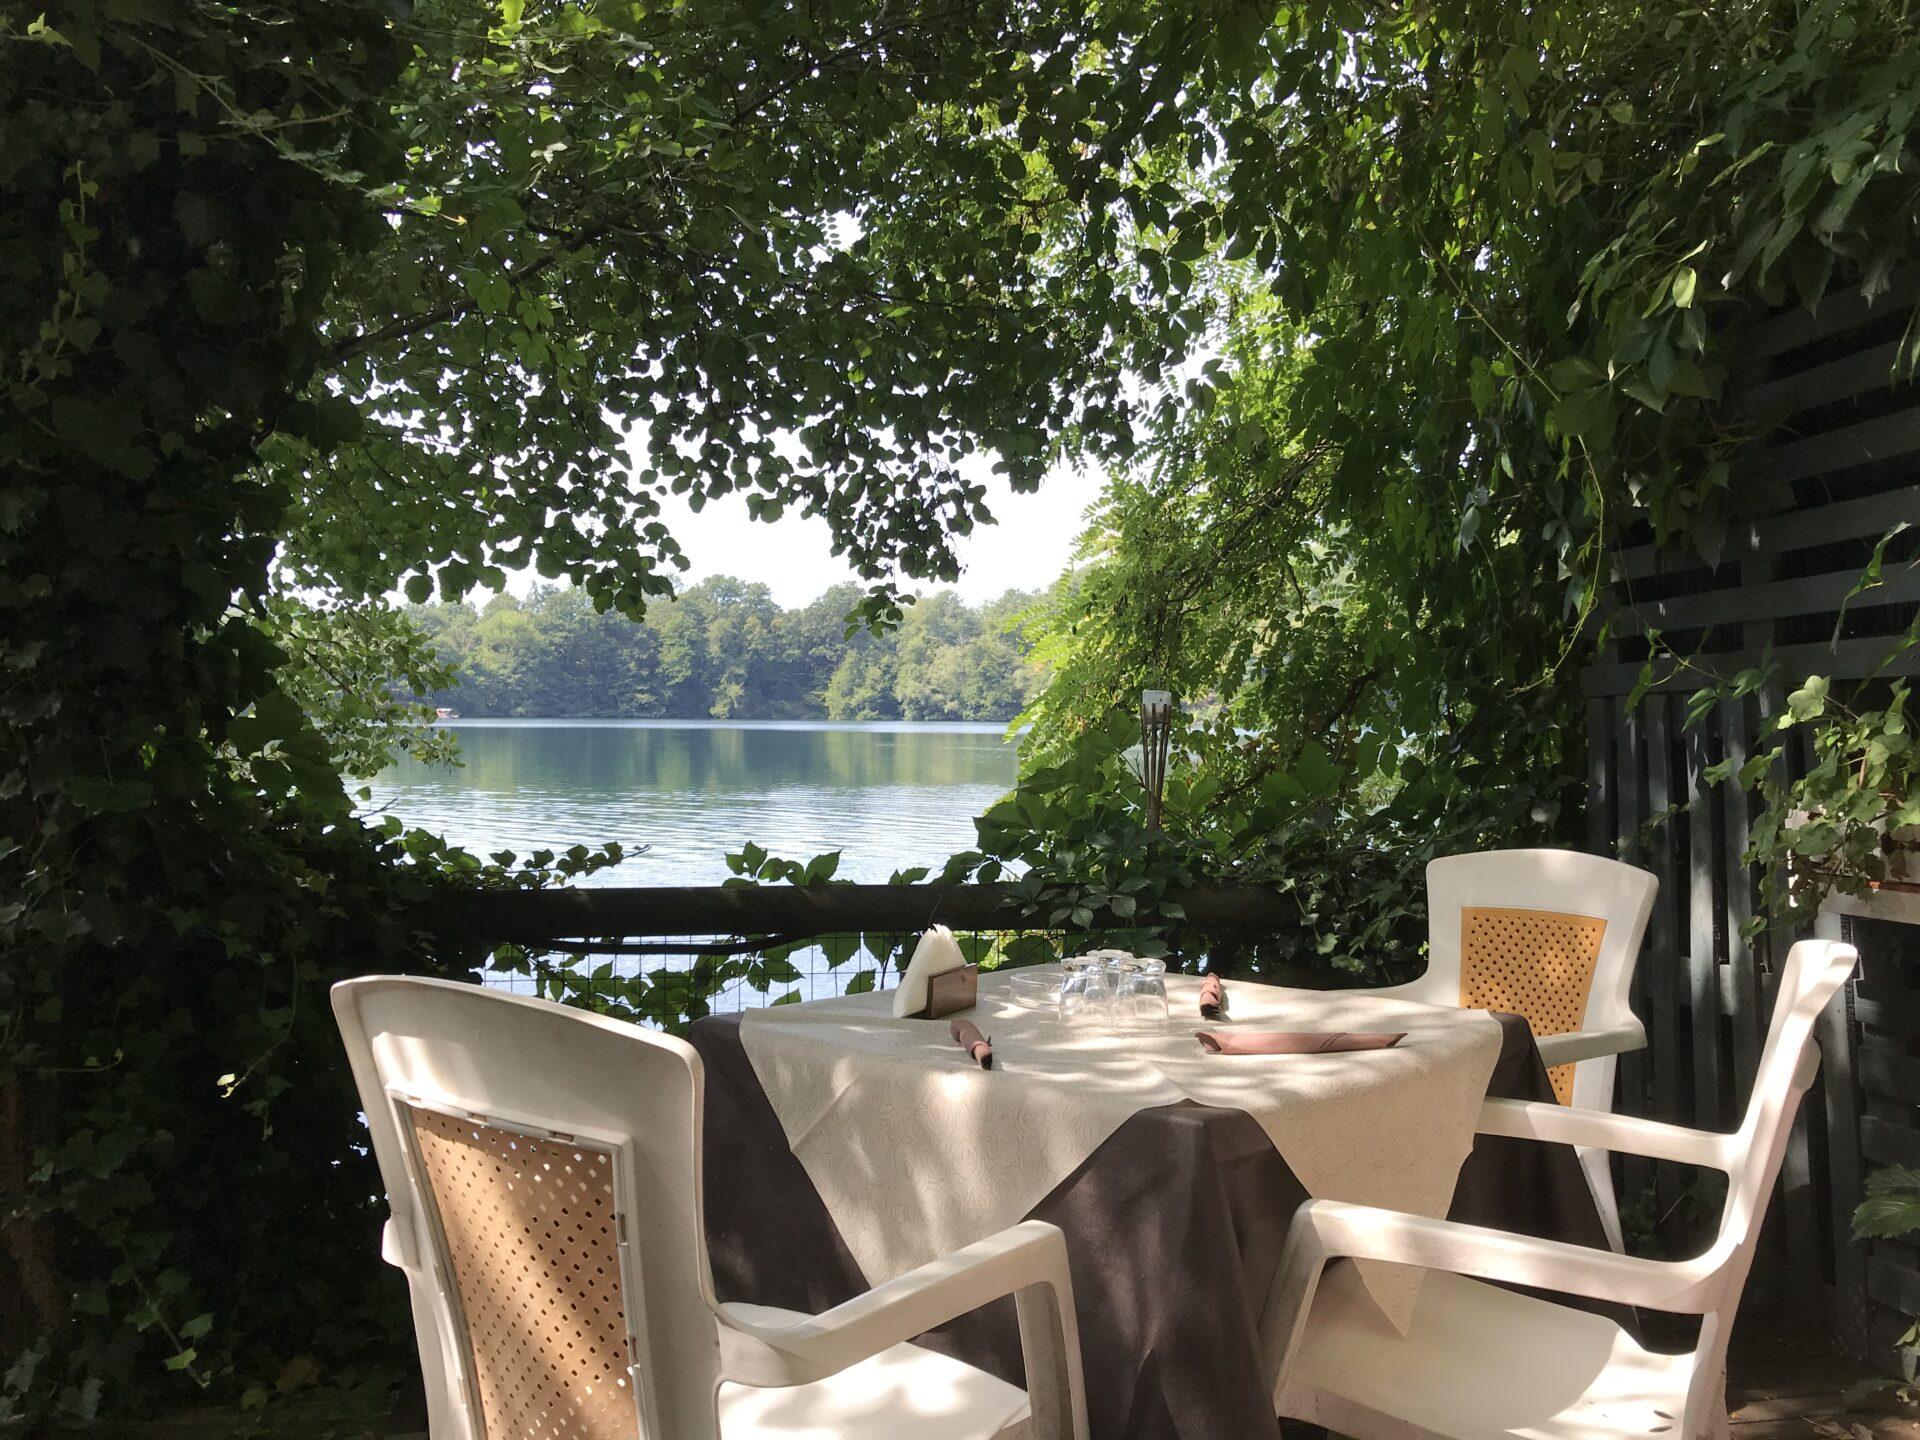 Vor dem Apero, lago piccolo di Monticchio